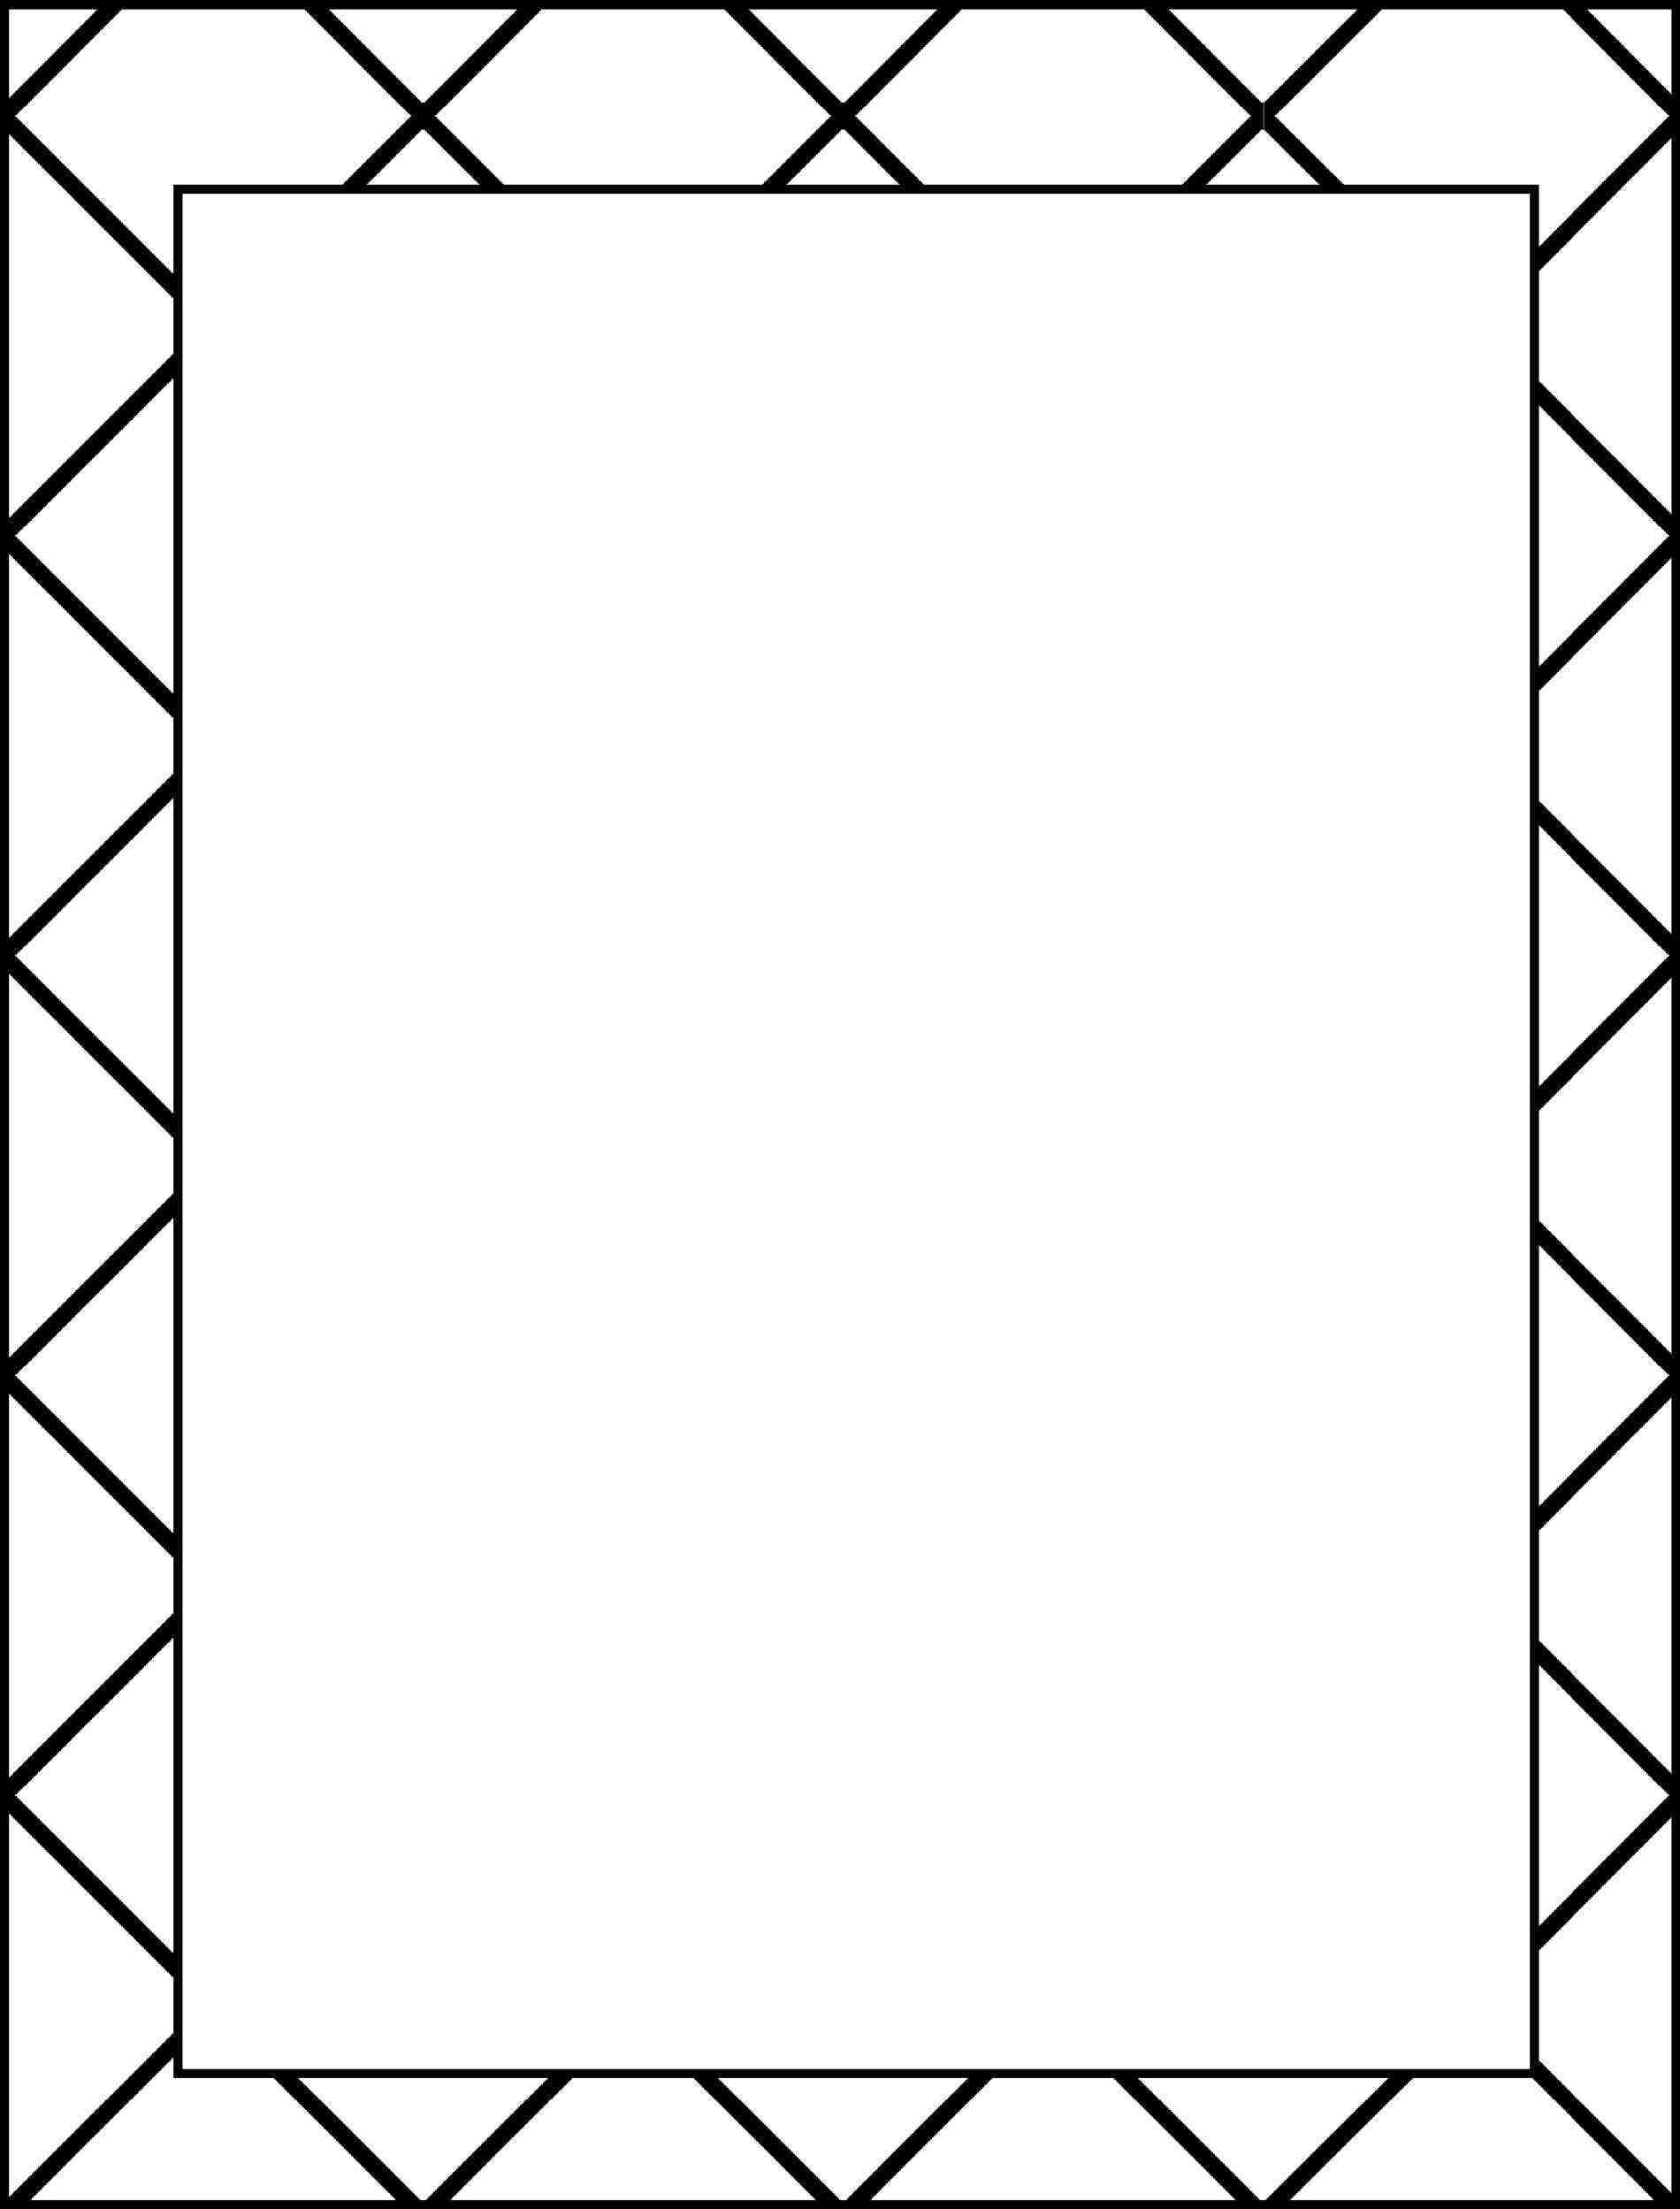 Border designs for school. Borders clipart easy